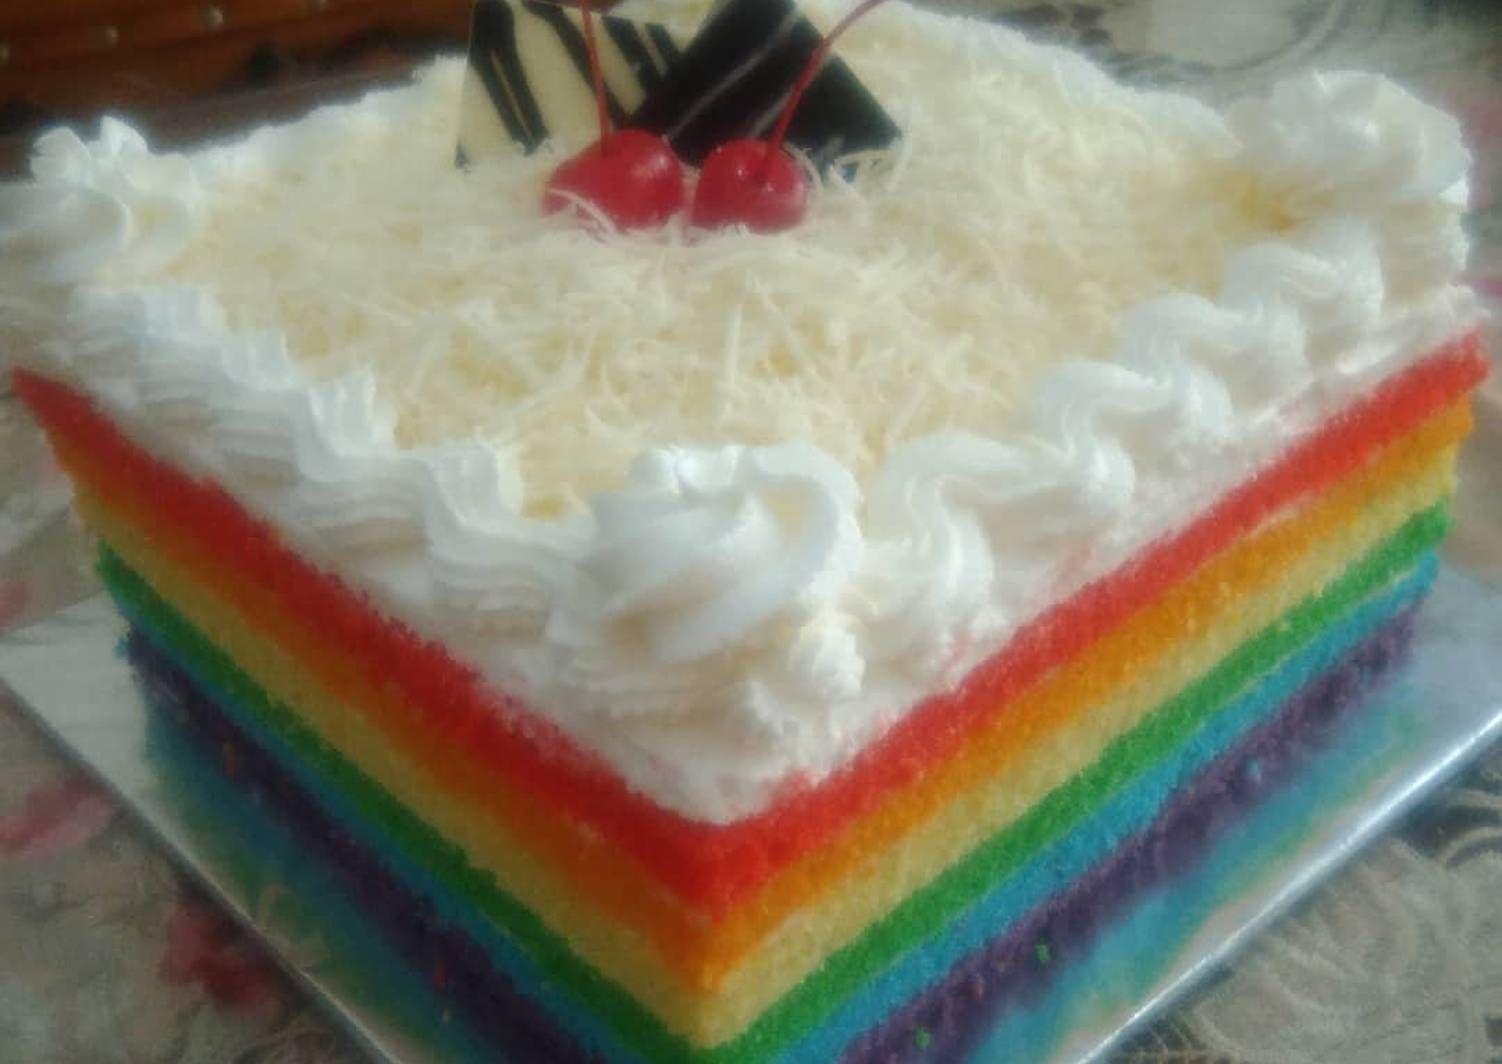 Resep Rainbow Cake Kukus Super Lembut Oleh Vivien Marwan Resep Kue Pelangi Kue Mangkok Resep